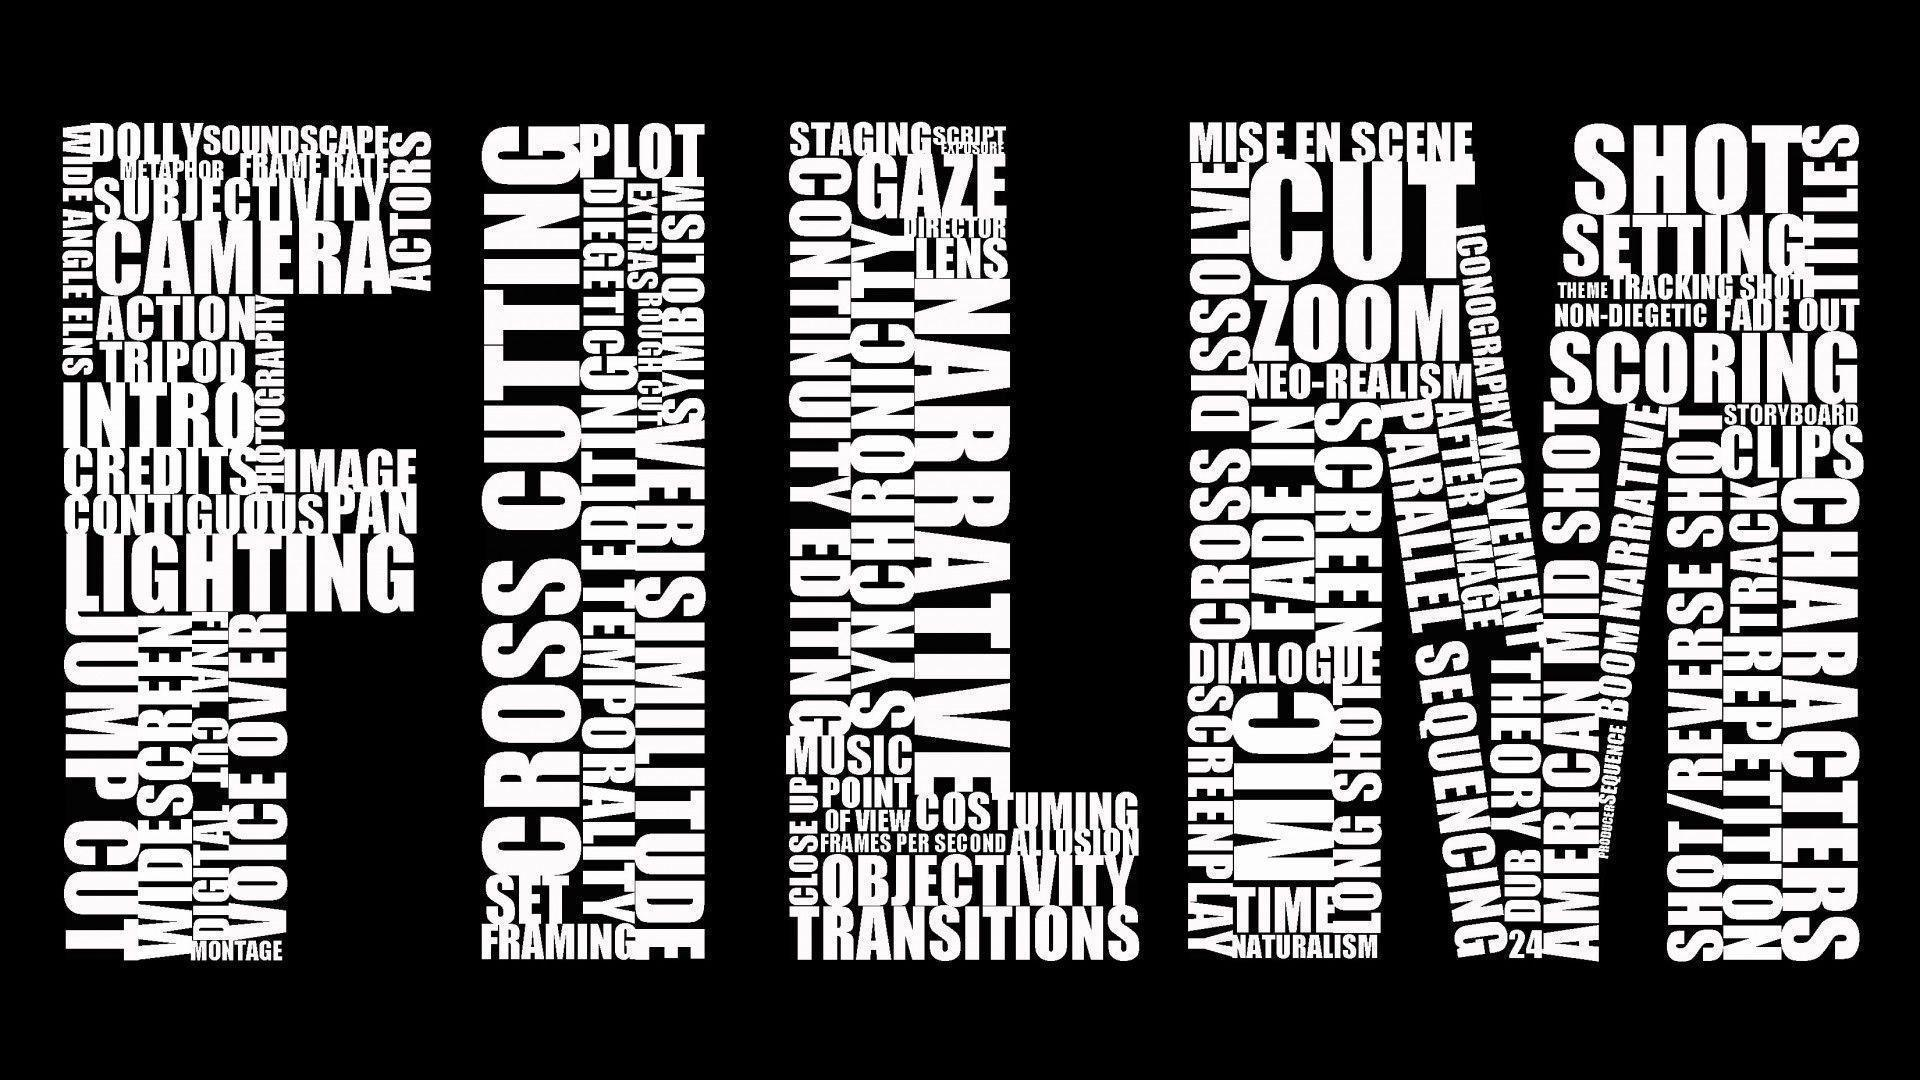 cinematographer wallpaper - photo #29